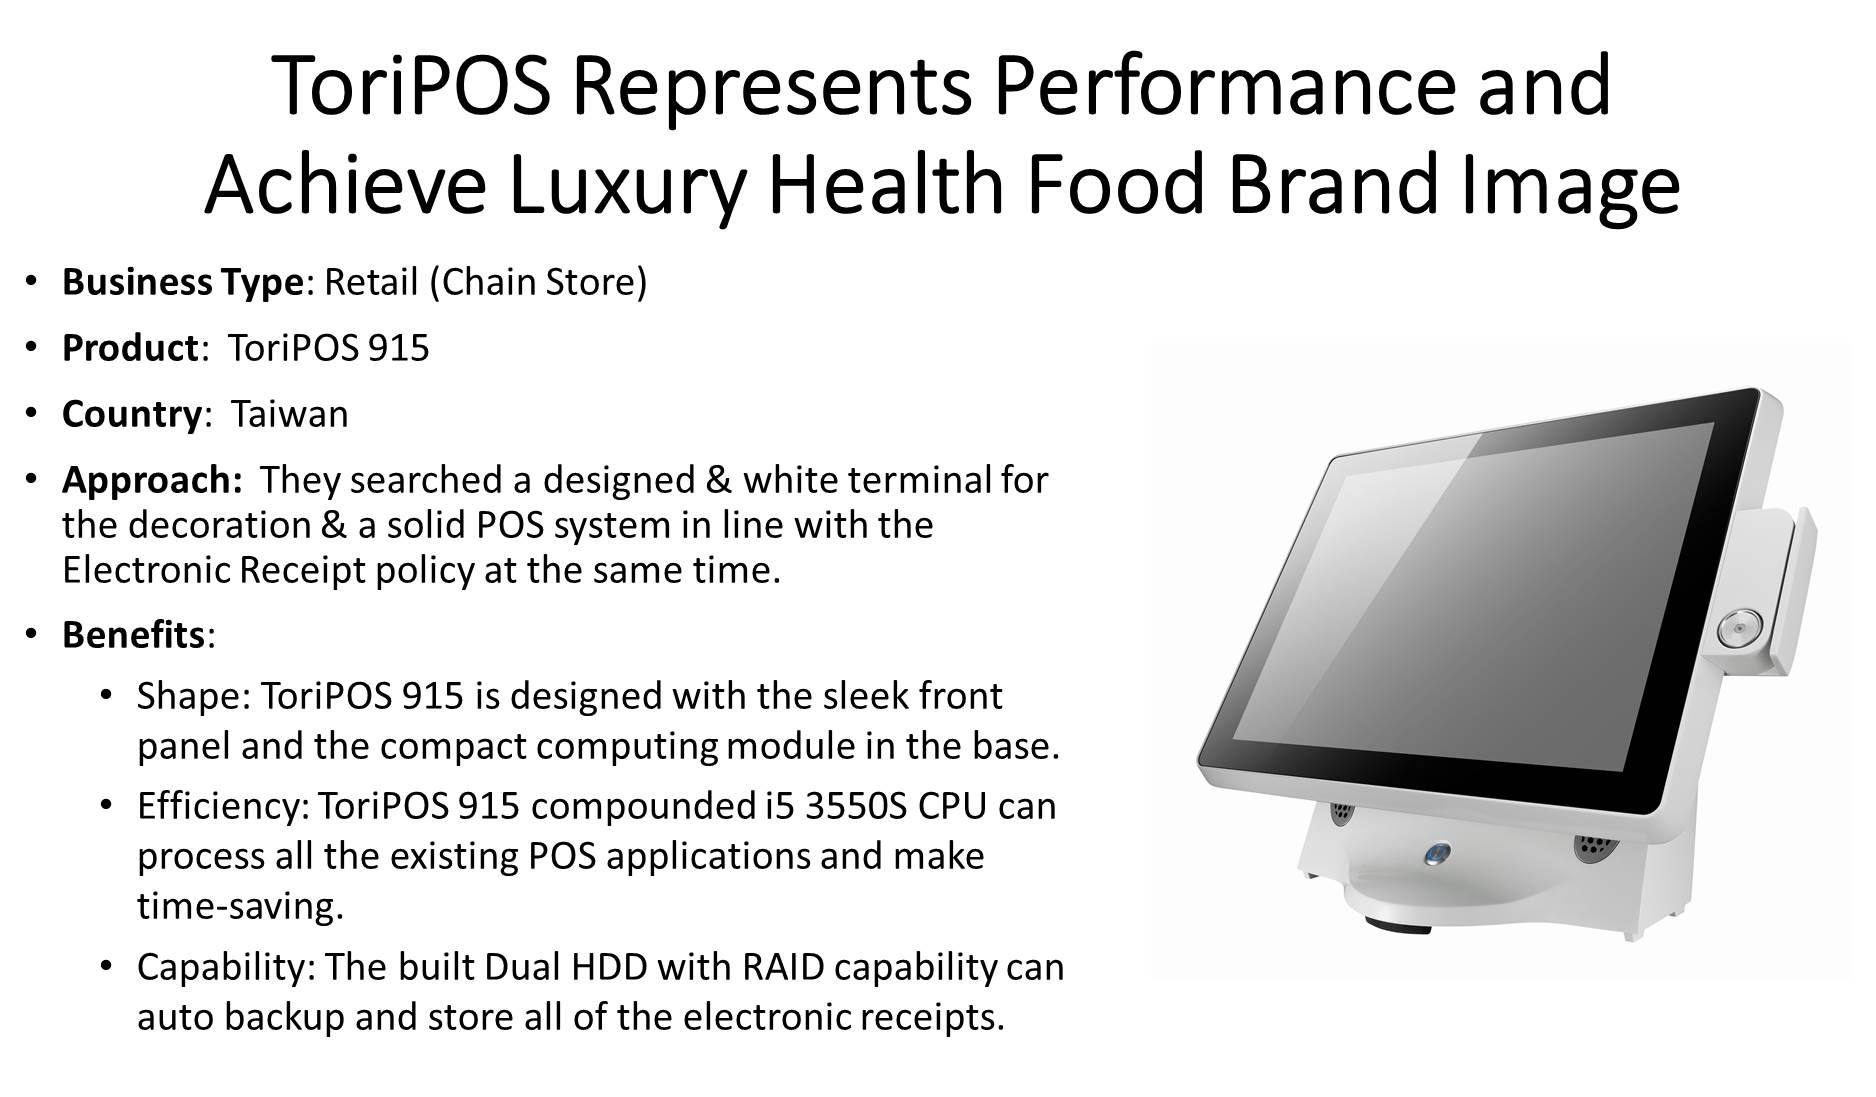 ToriPOS 915 in luxury health food retail